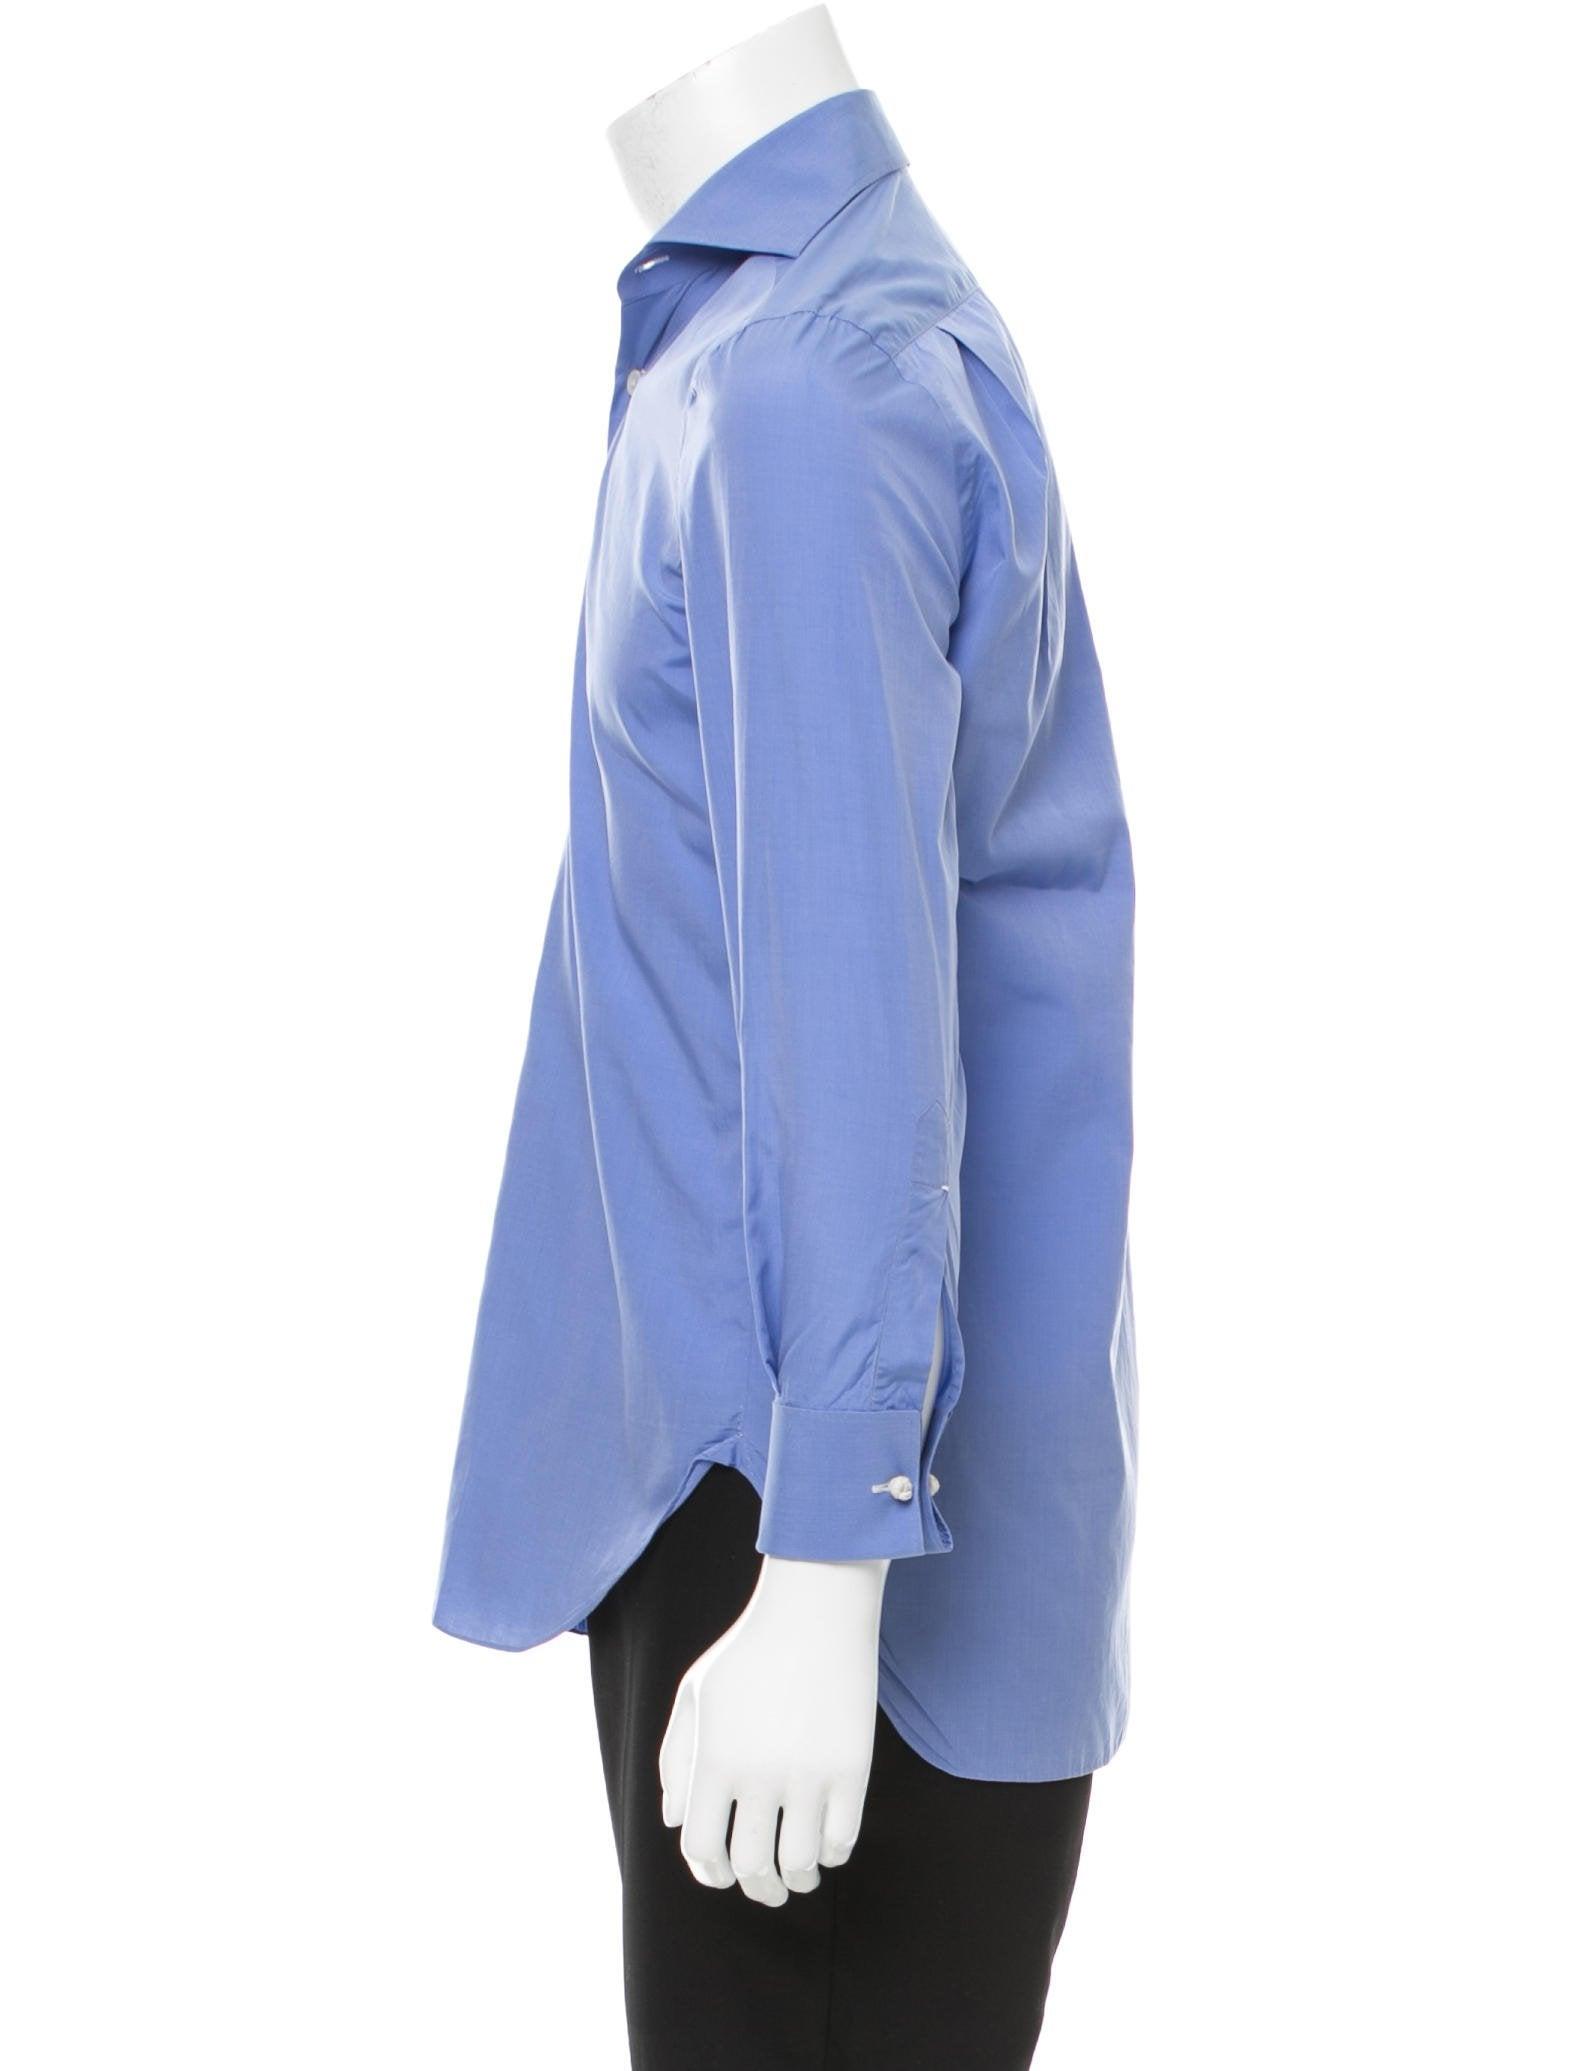 Kiton Long Sleeve Button Up Shirt Clothing Kit21837